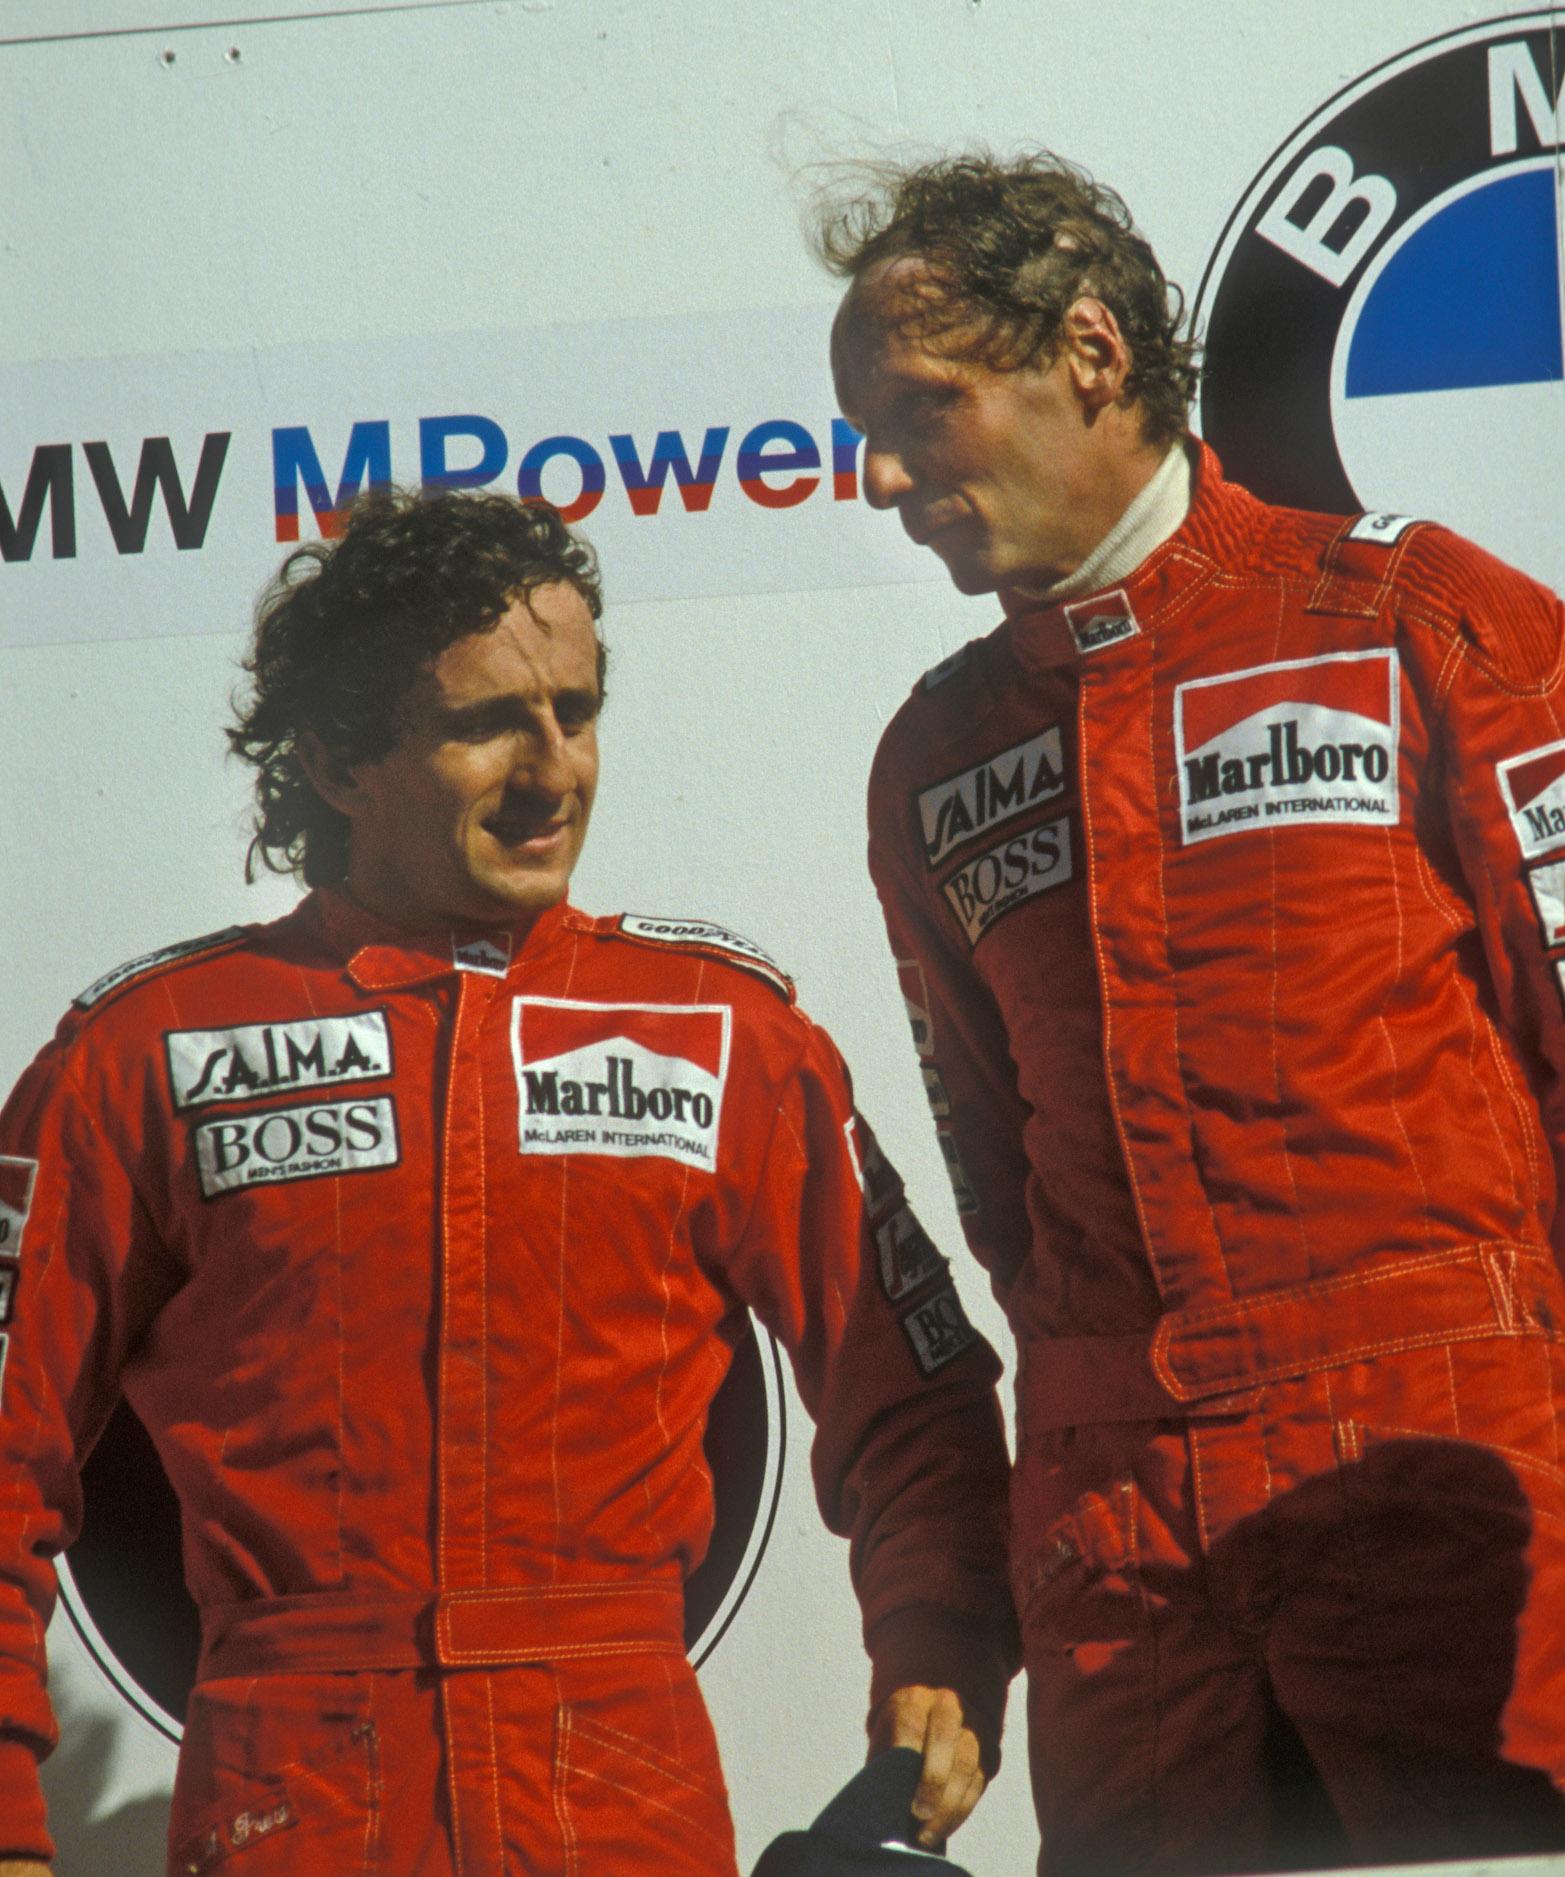 Alain-Prost-and-Niki-Lauda-on-the-Zandvoort-podium-in-1985